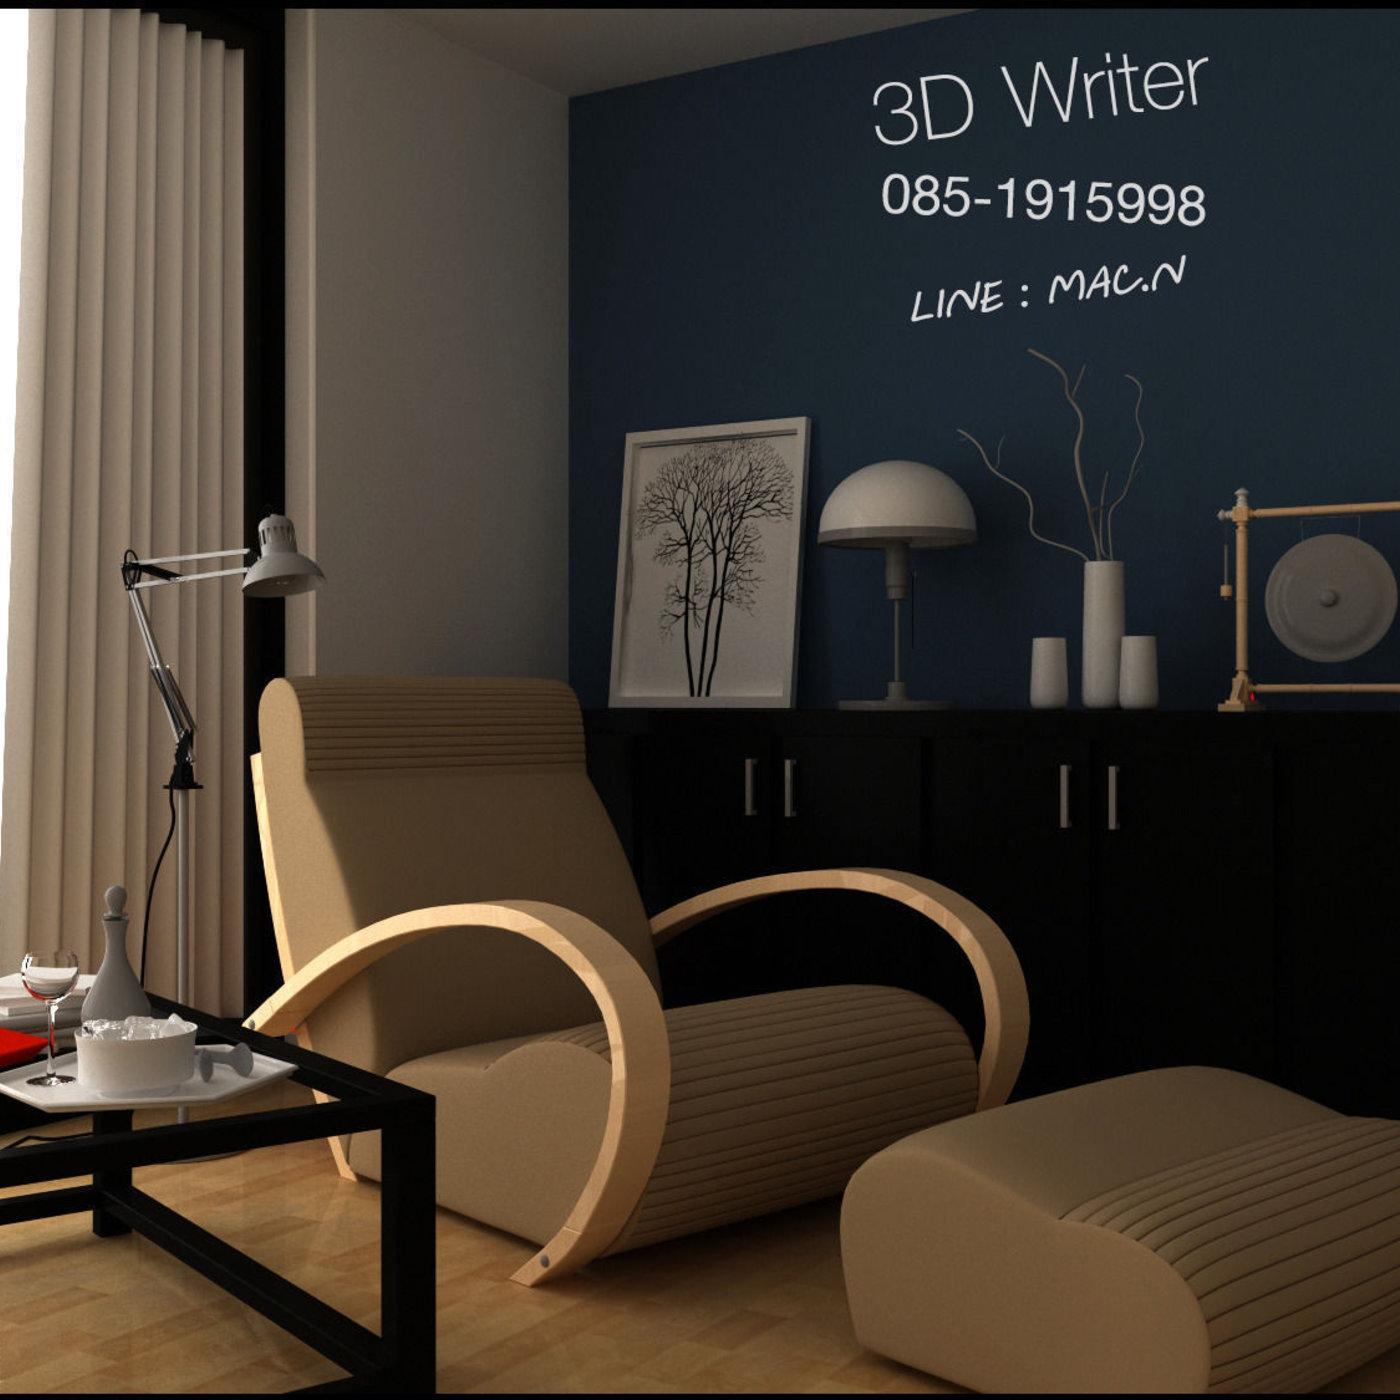 3D writer profile